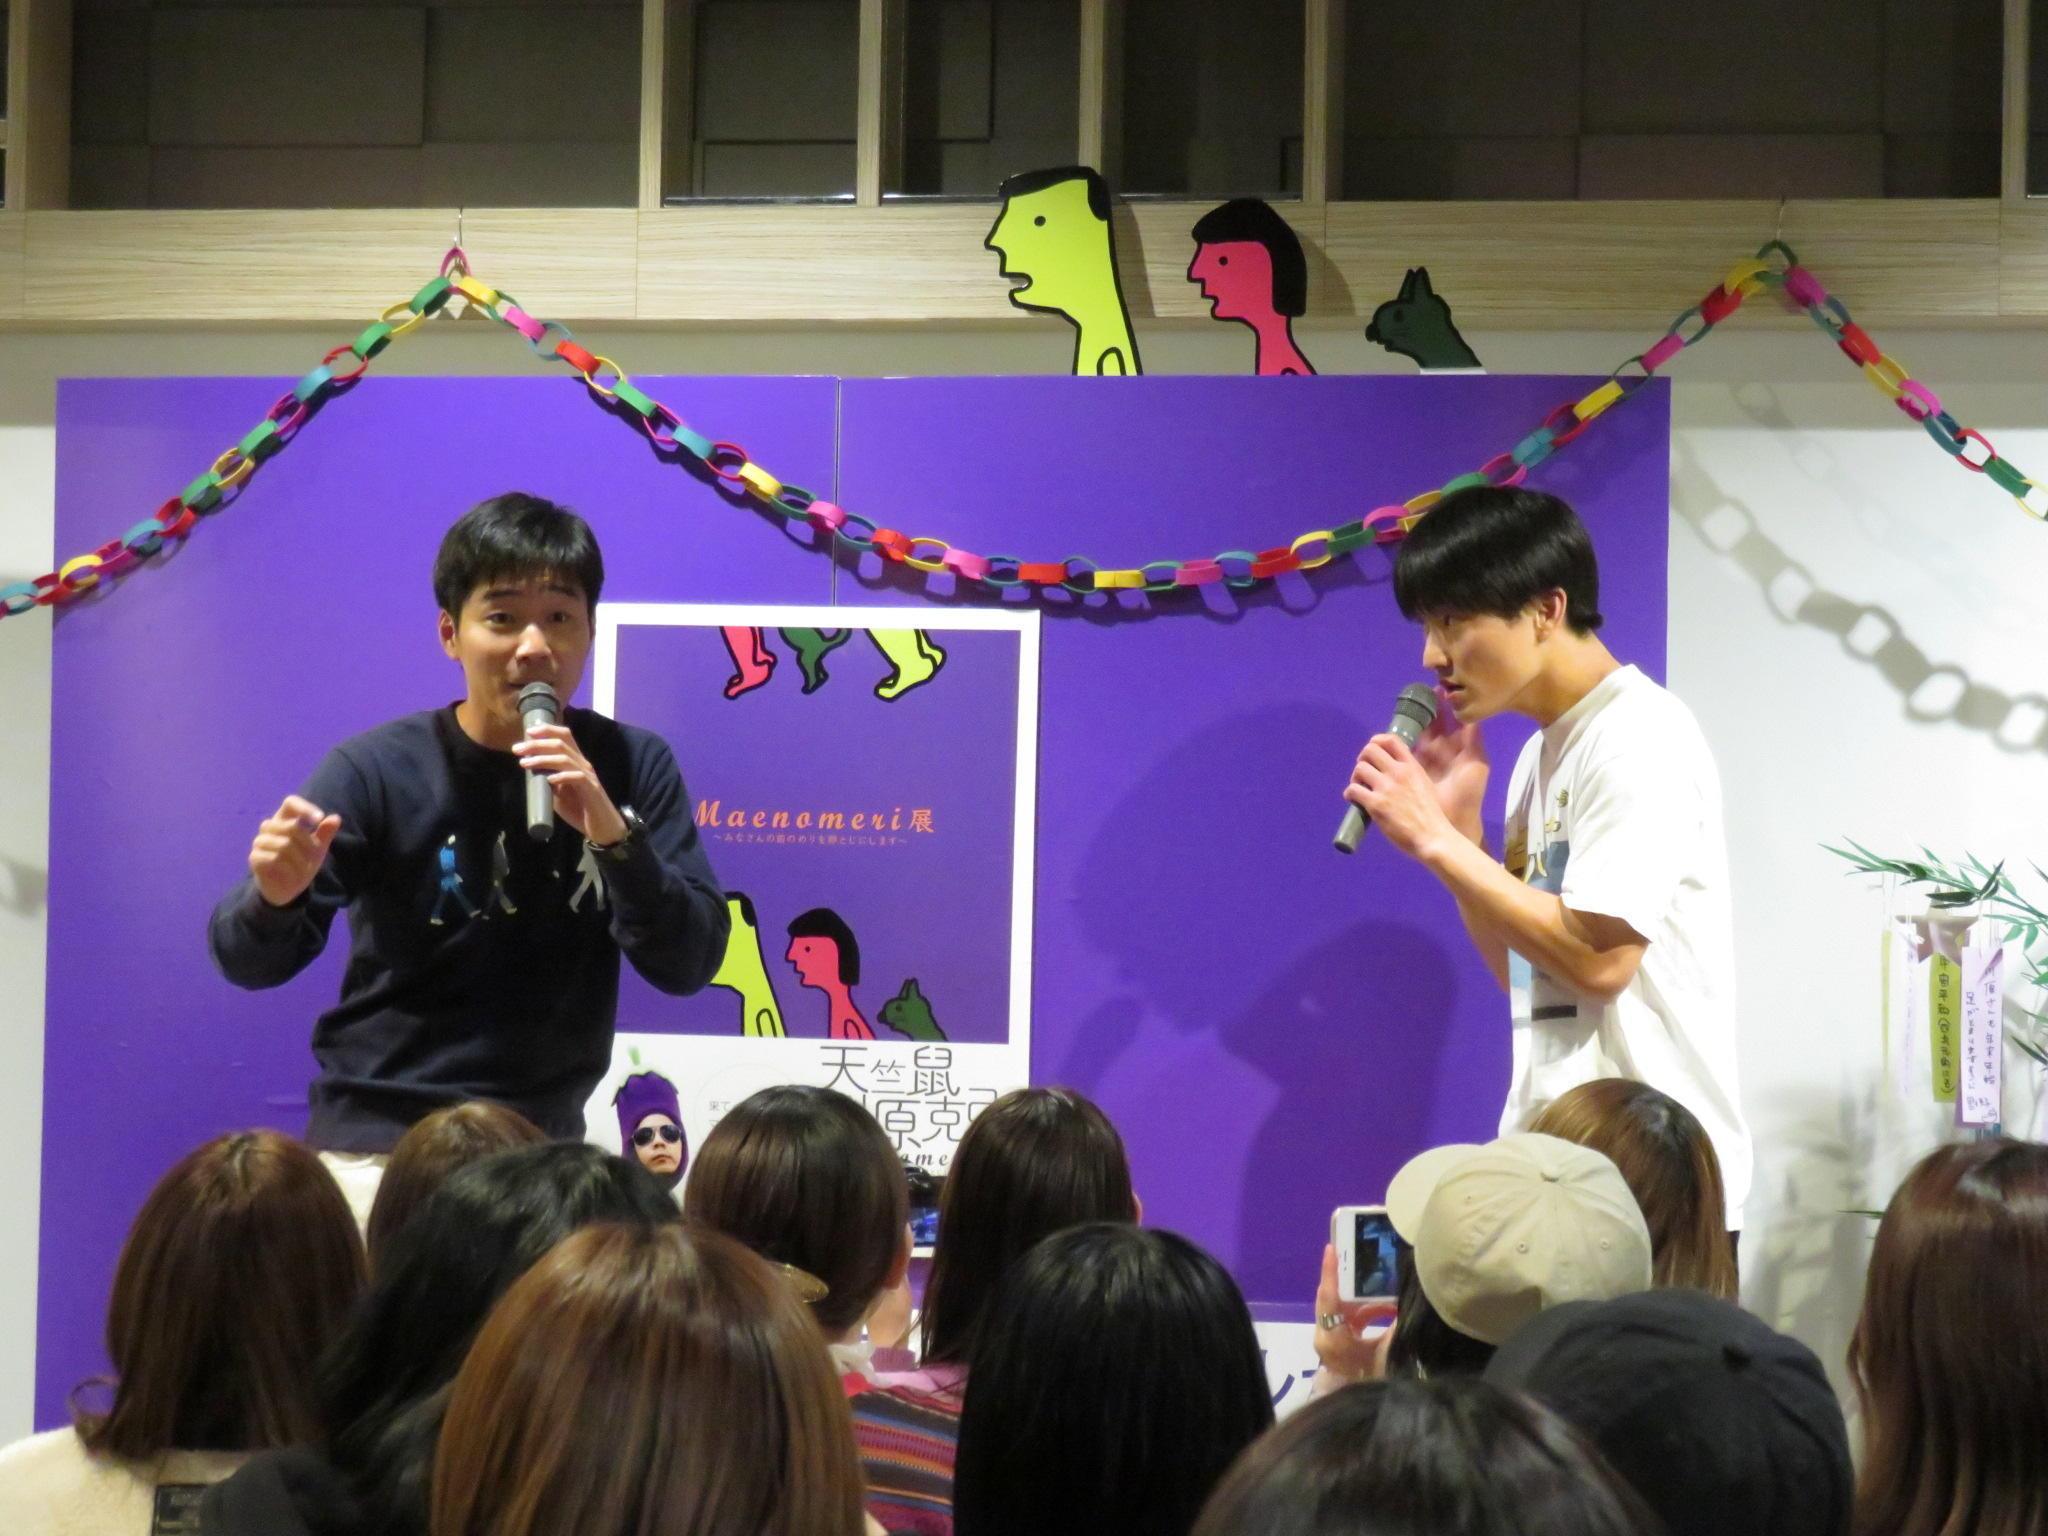 http://news.yoshimoto.co.jp/20190201193208-0e7ae22b1a9b599d99edc2635cd7e7b3ce46eef9.jpg